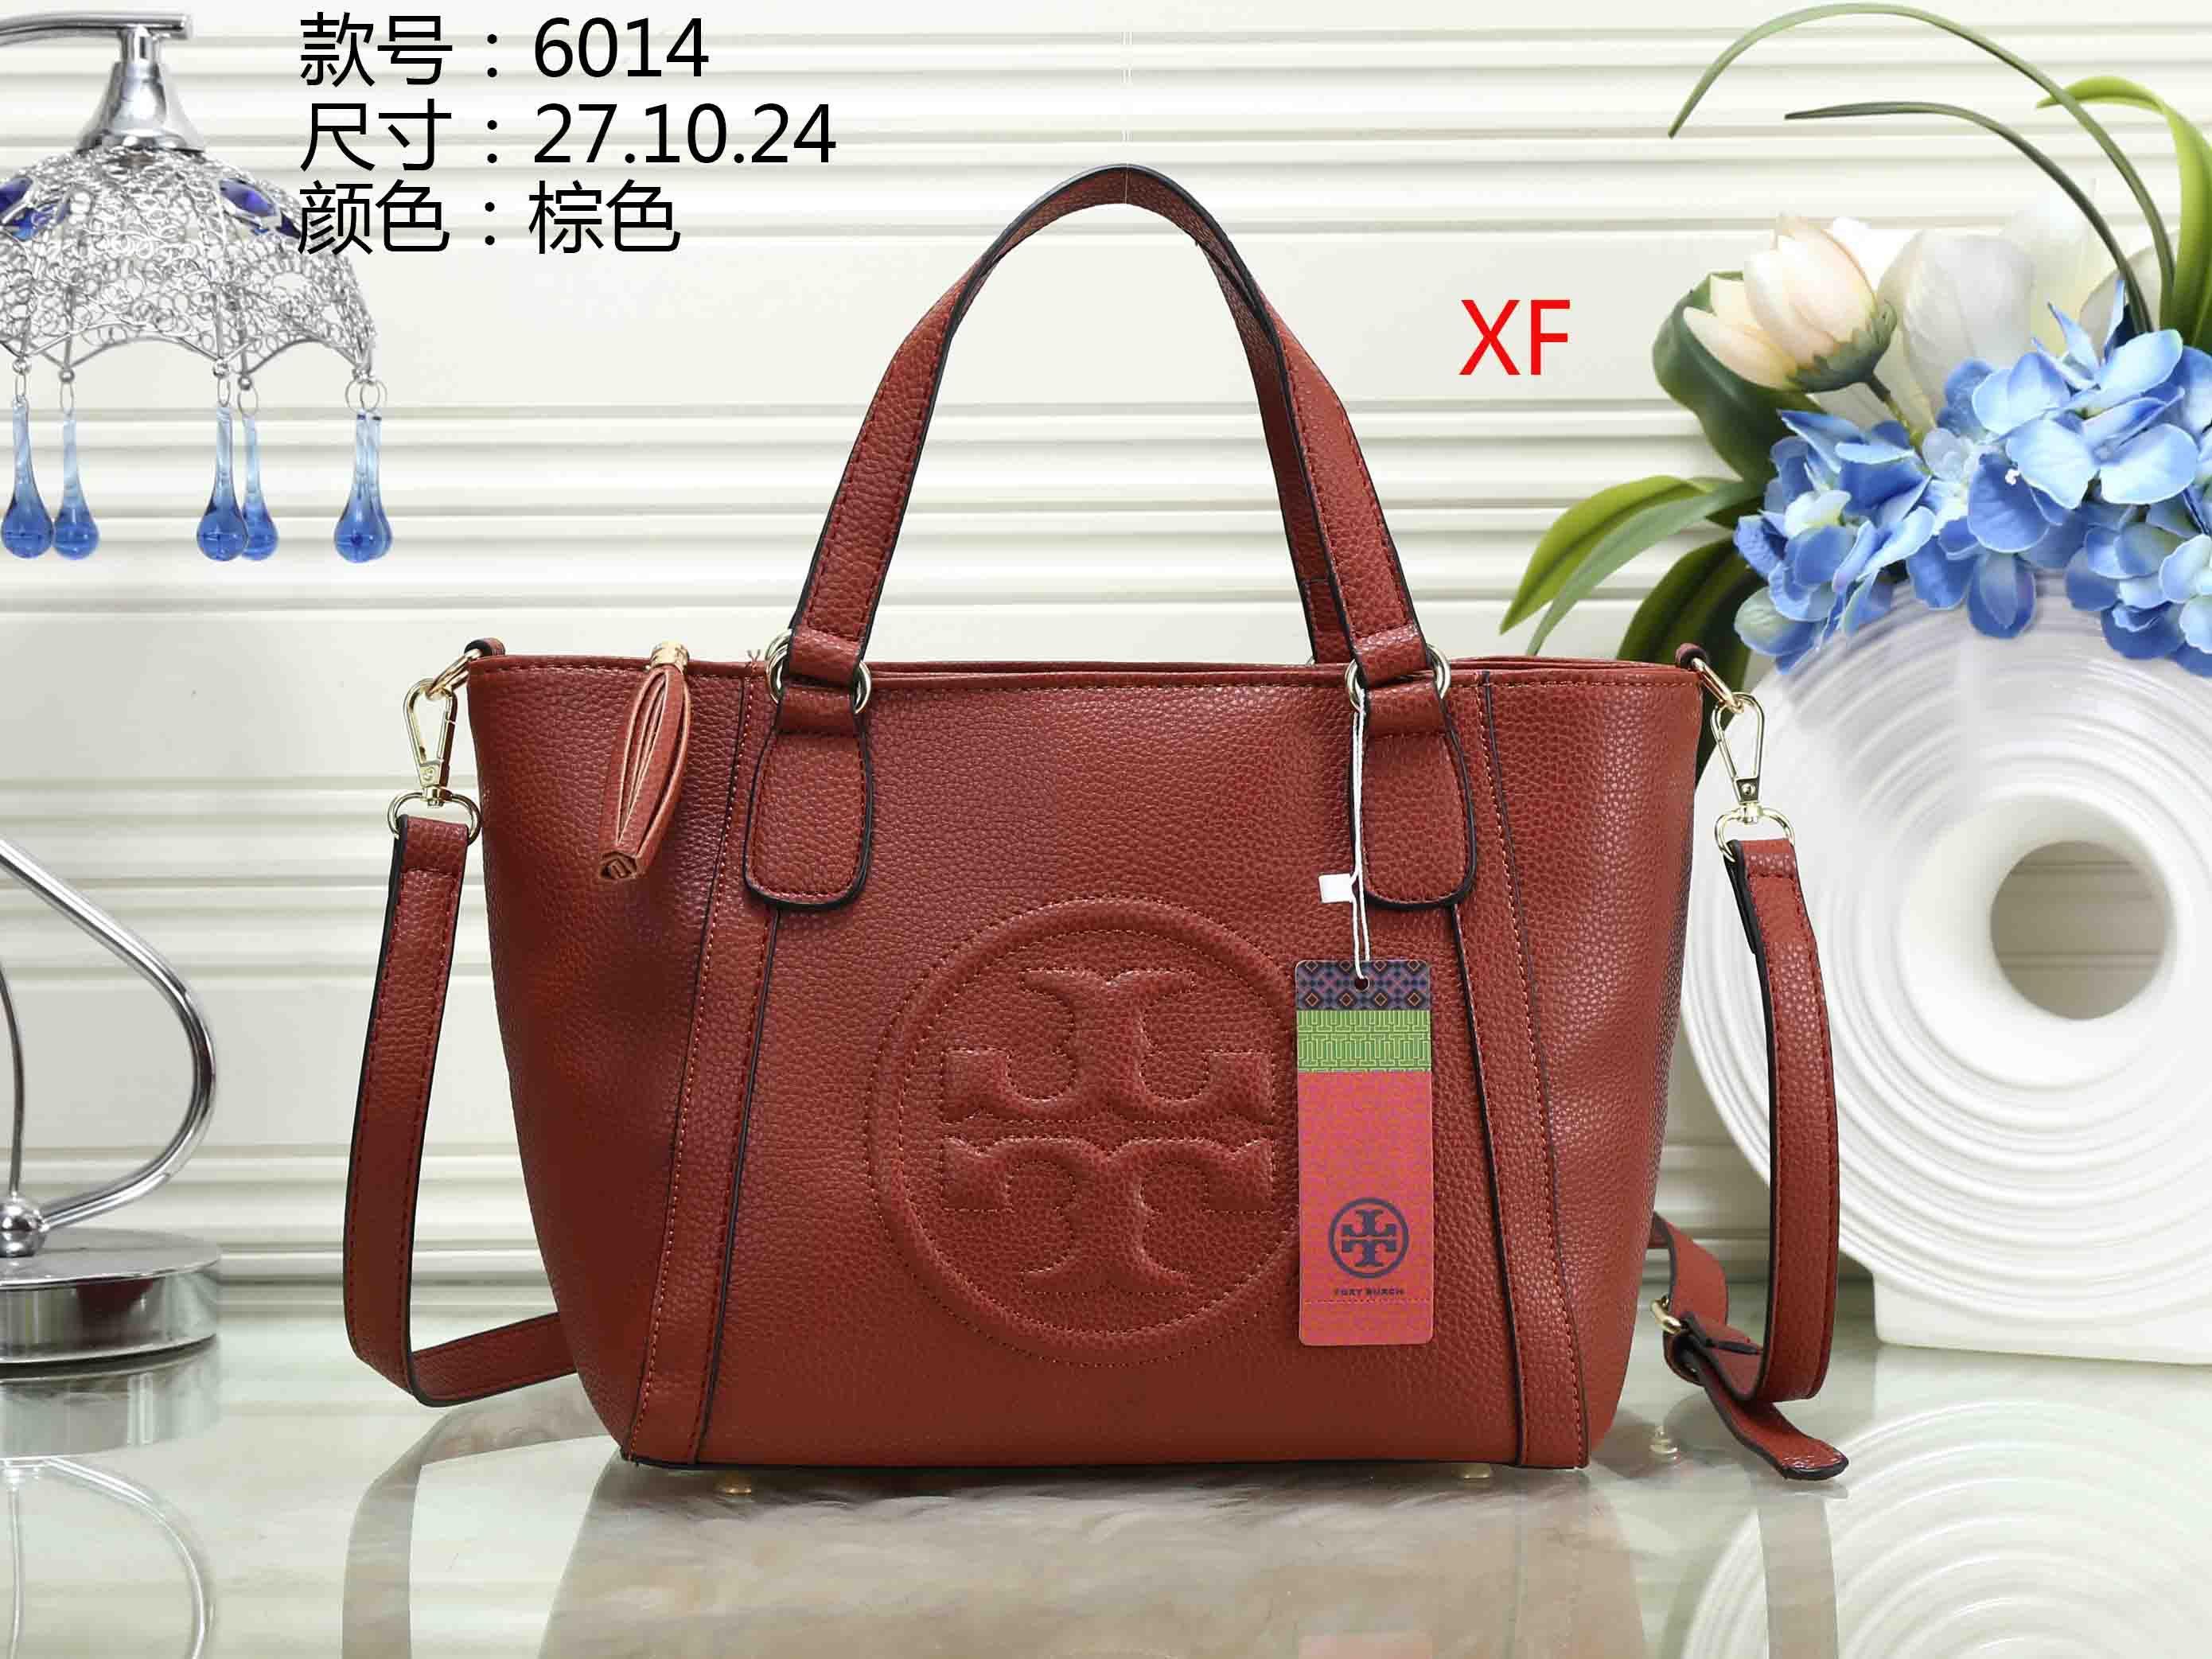 2160a4db026 Luxury Handbags PU Leather Women Bag Hot Shoulder Bag Messenger ...